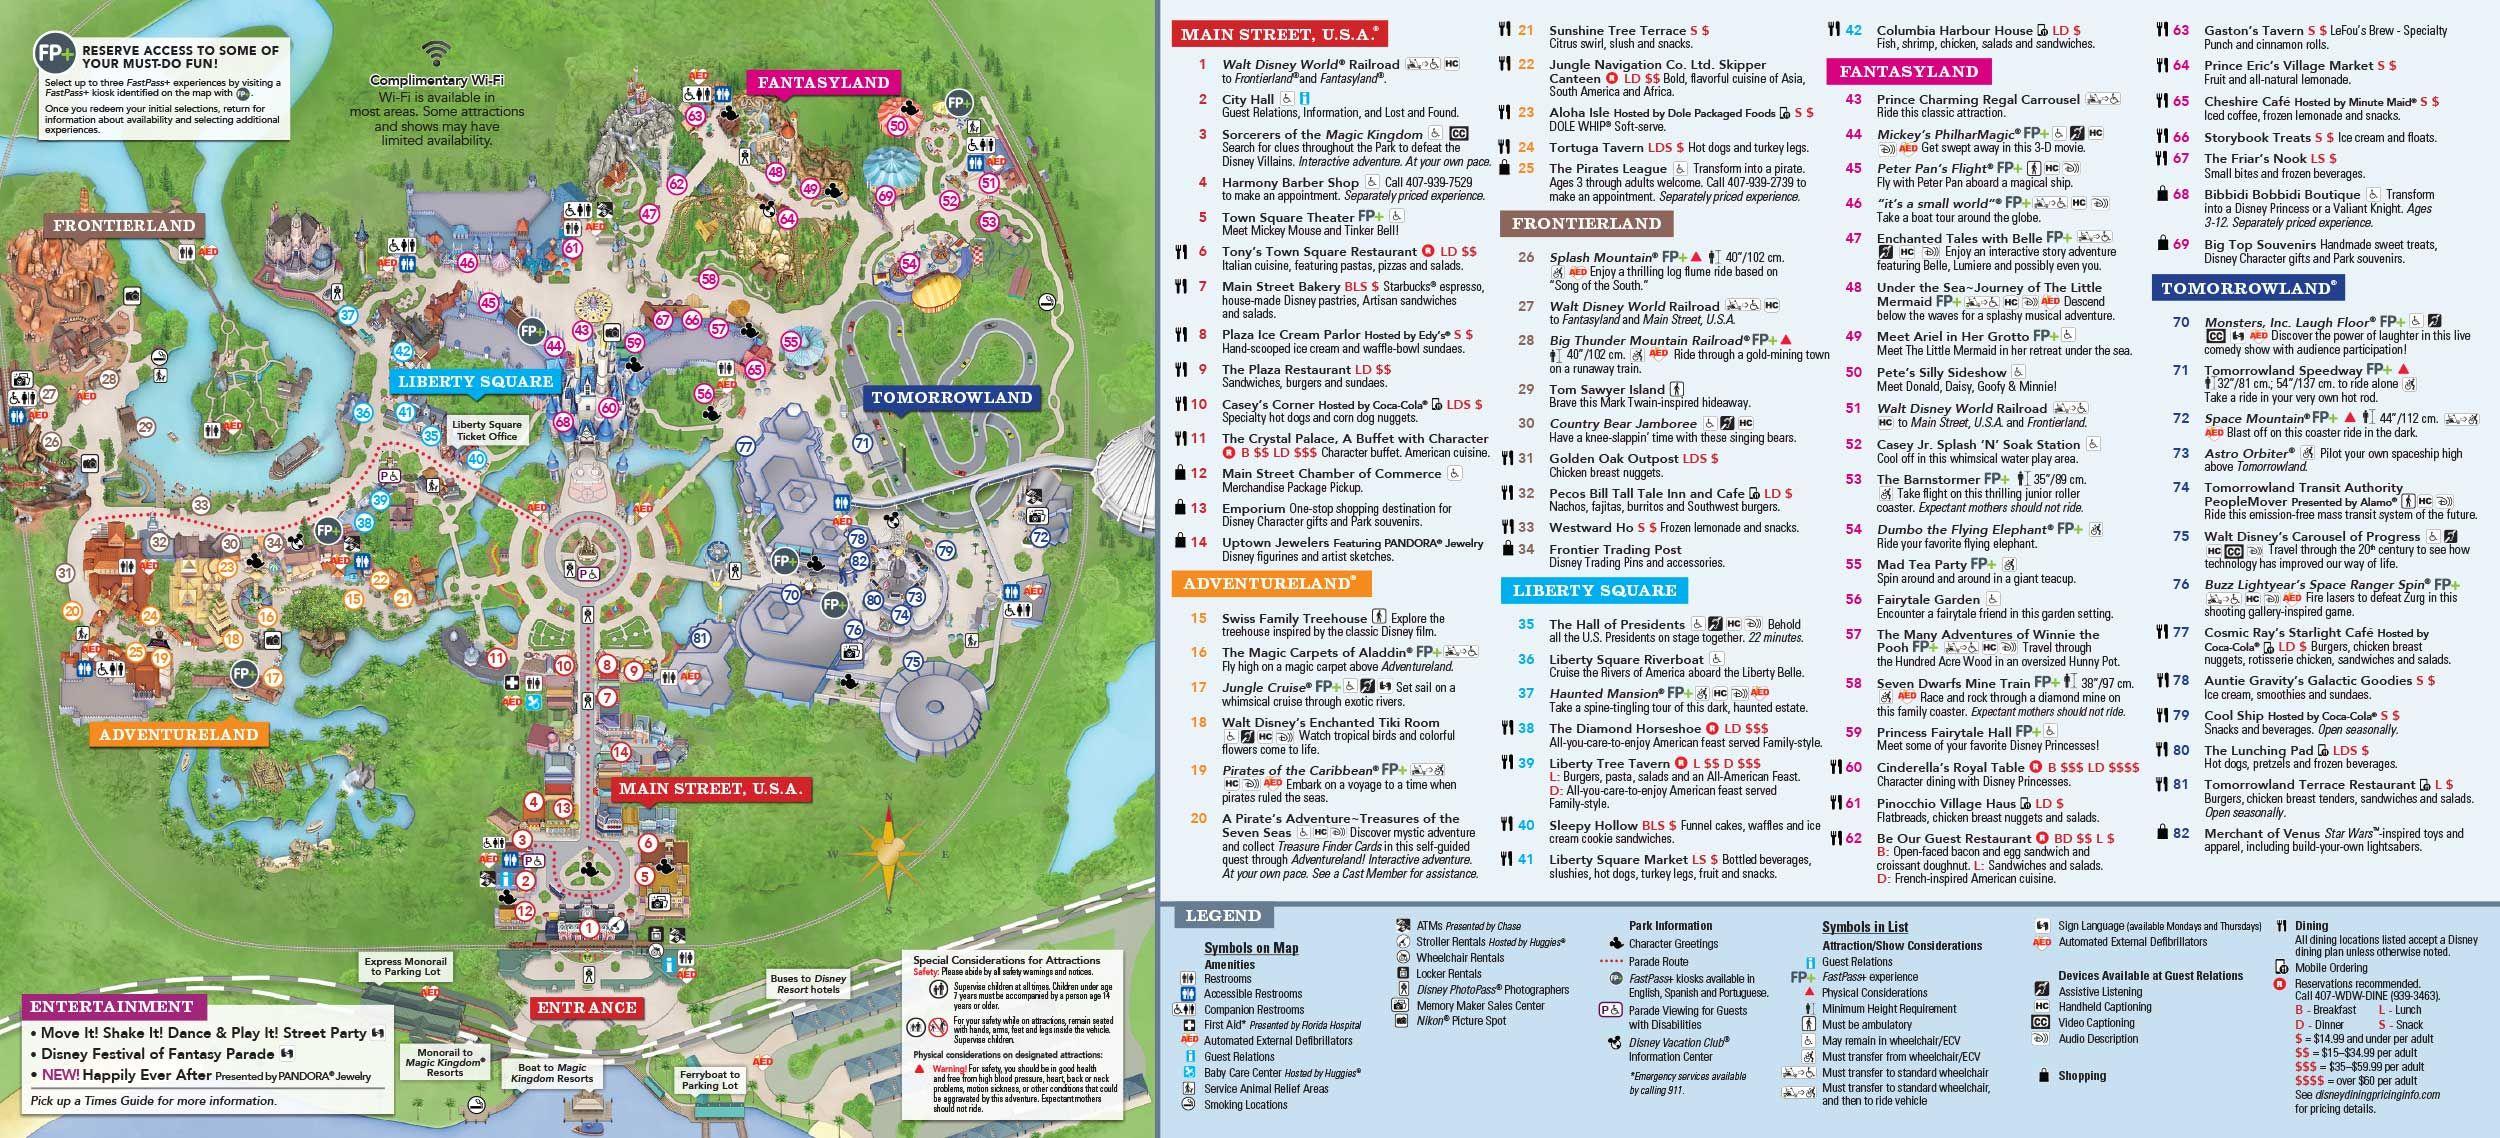 Este é o mapa do Magic Kingdom. A Enchanted Tales with Belle fica no Fantasyland, no número 47.